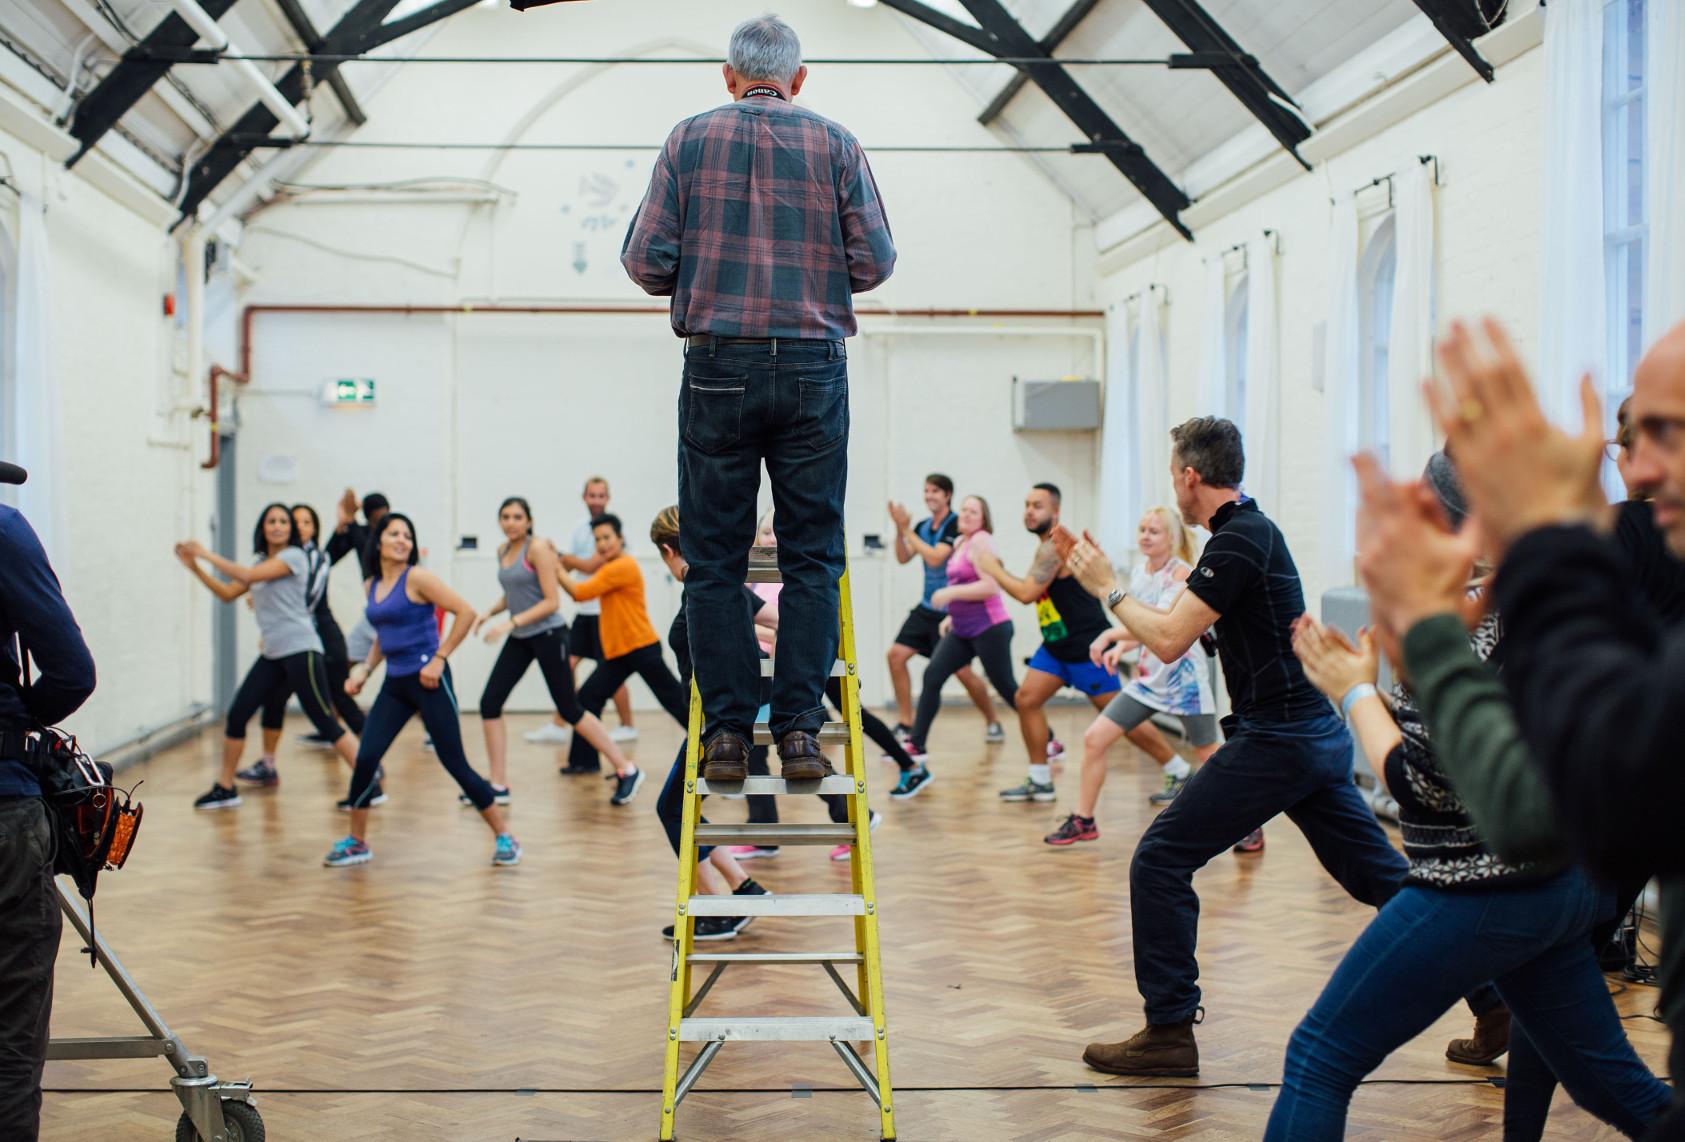 BBC Oneness - Exercise Class, Photographer: POLLY ALDERTON